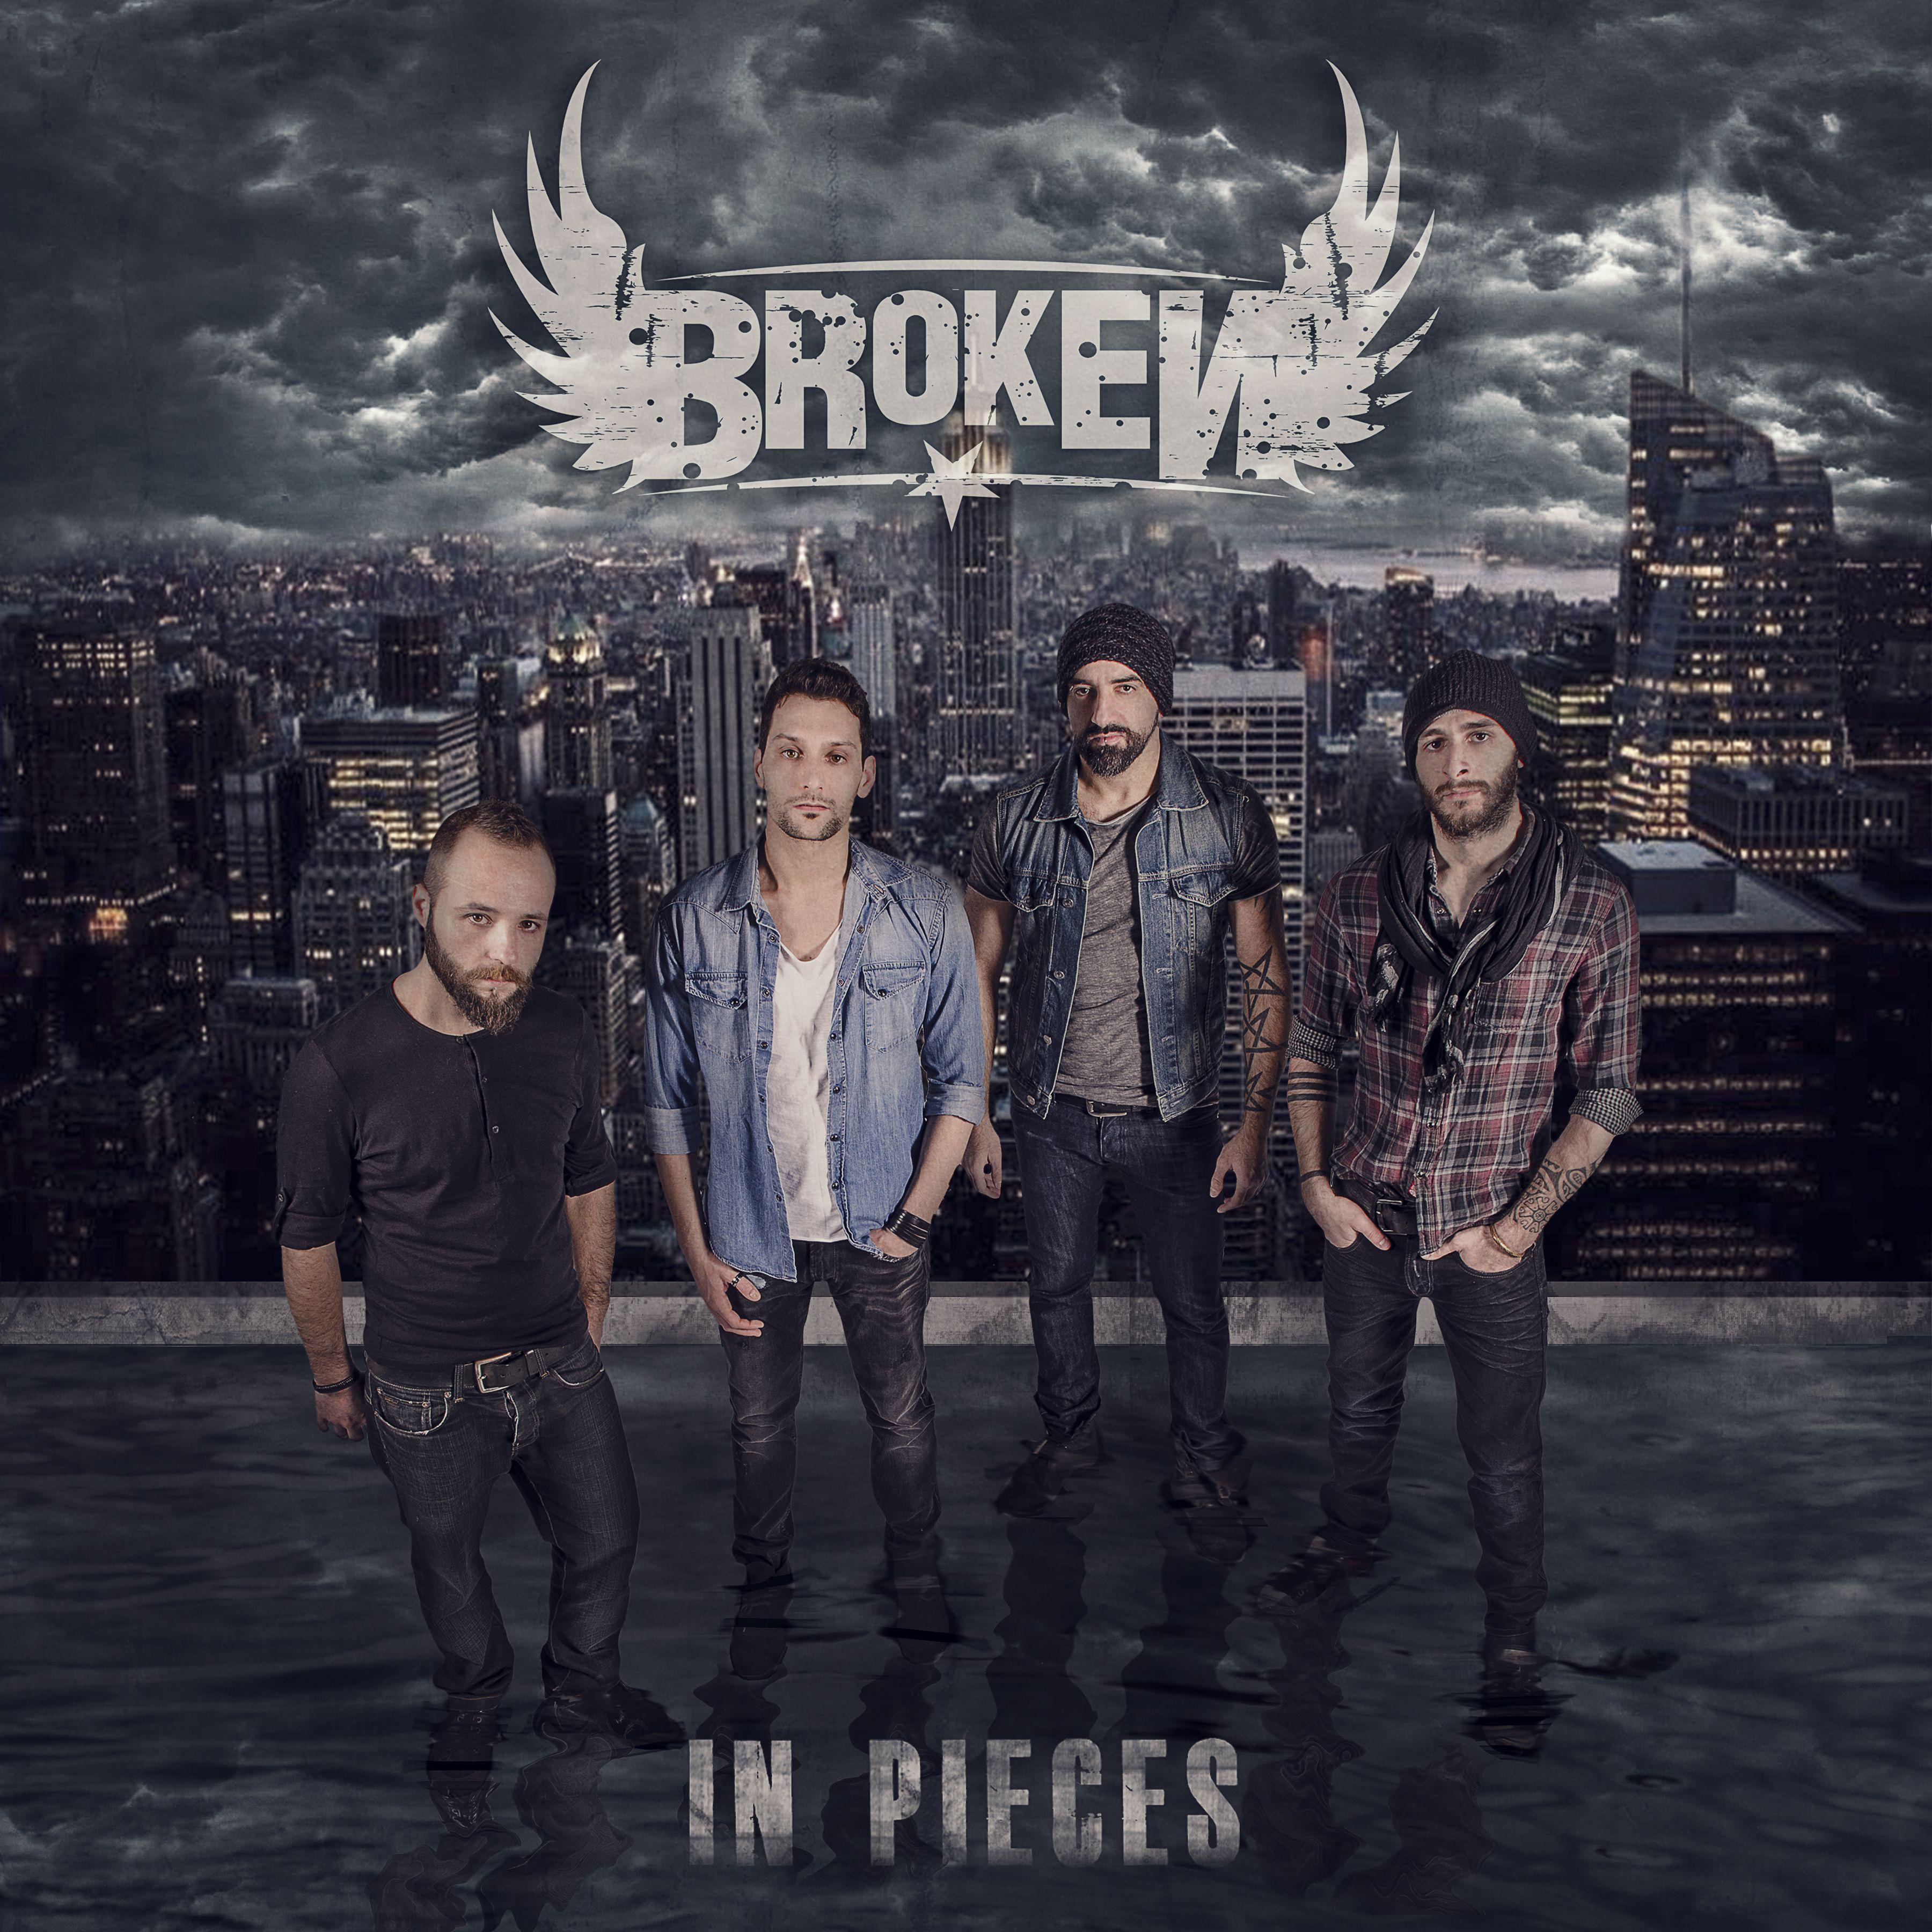 Broken - In Pieces - 2014